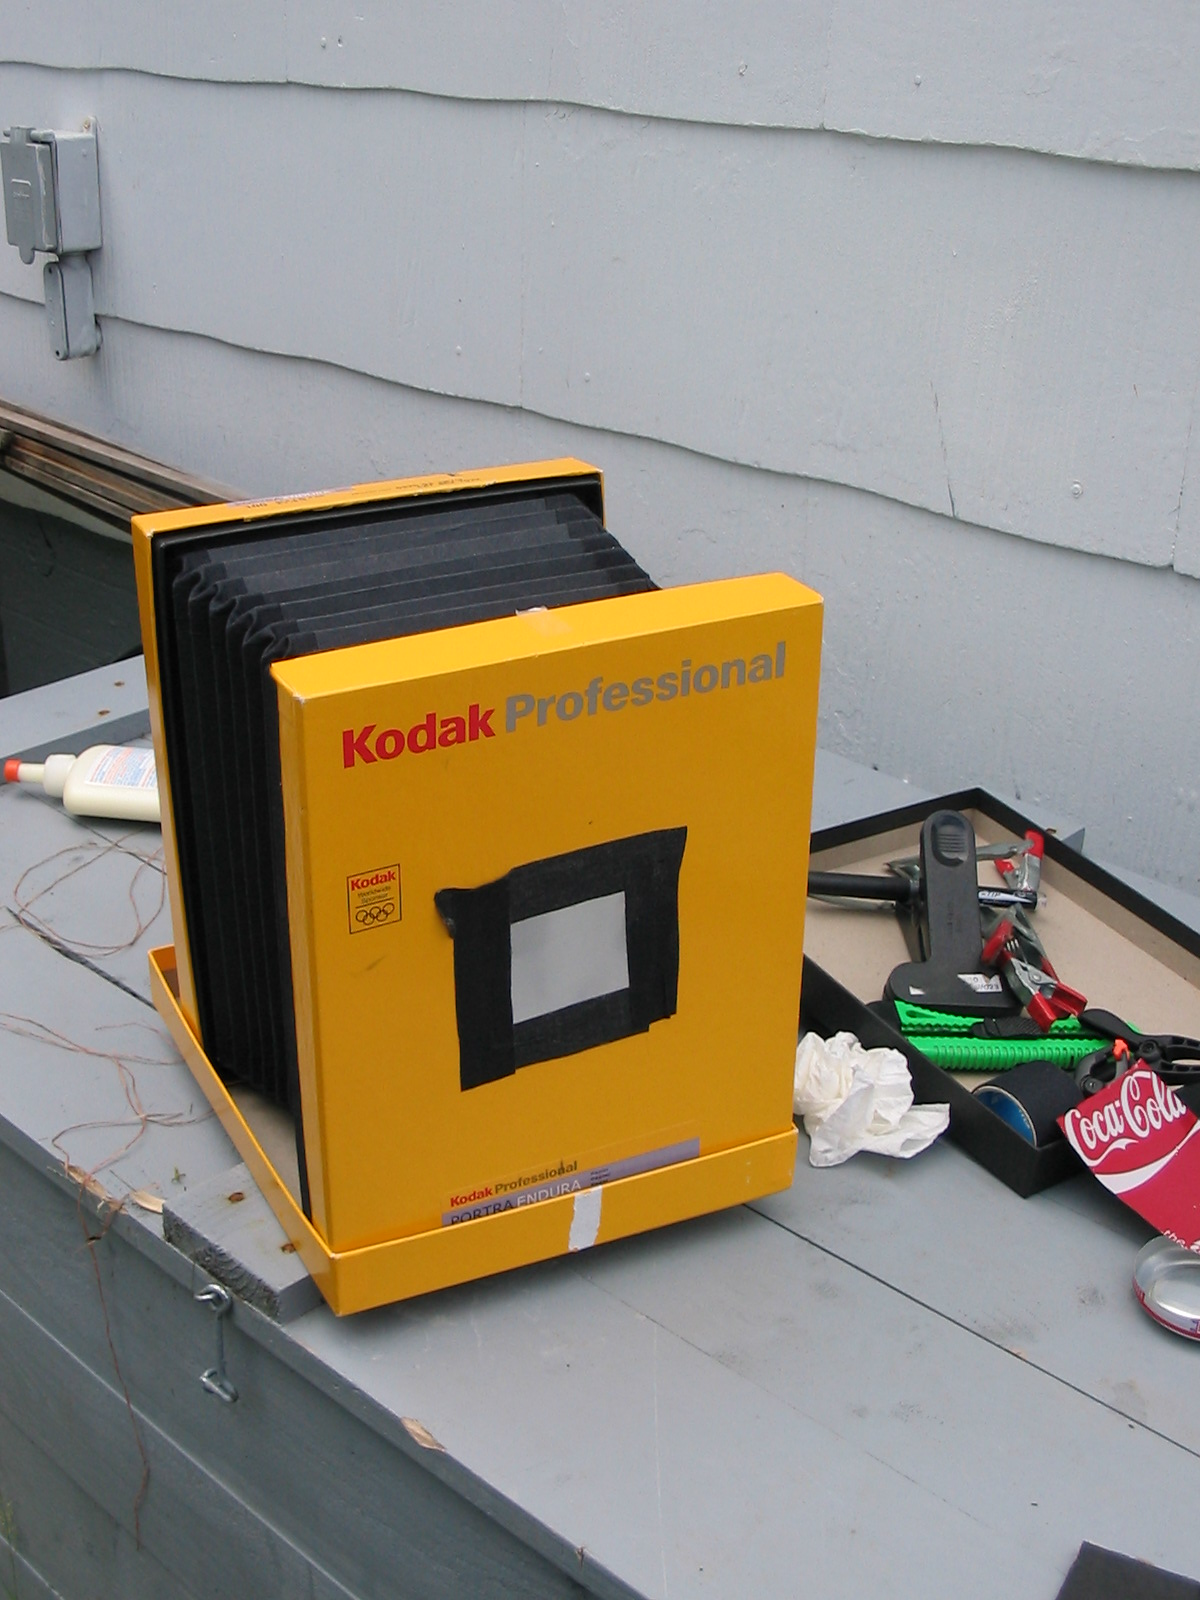 8X10 foldable pinhole camera